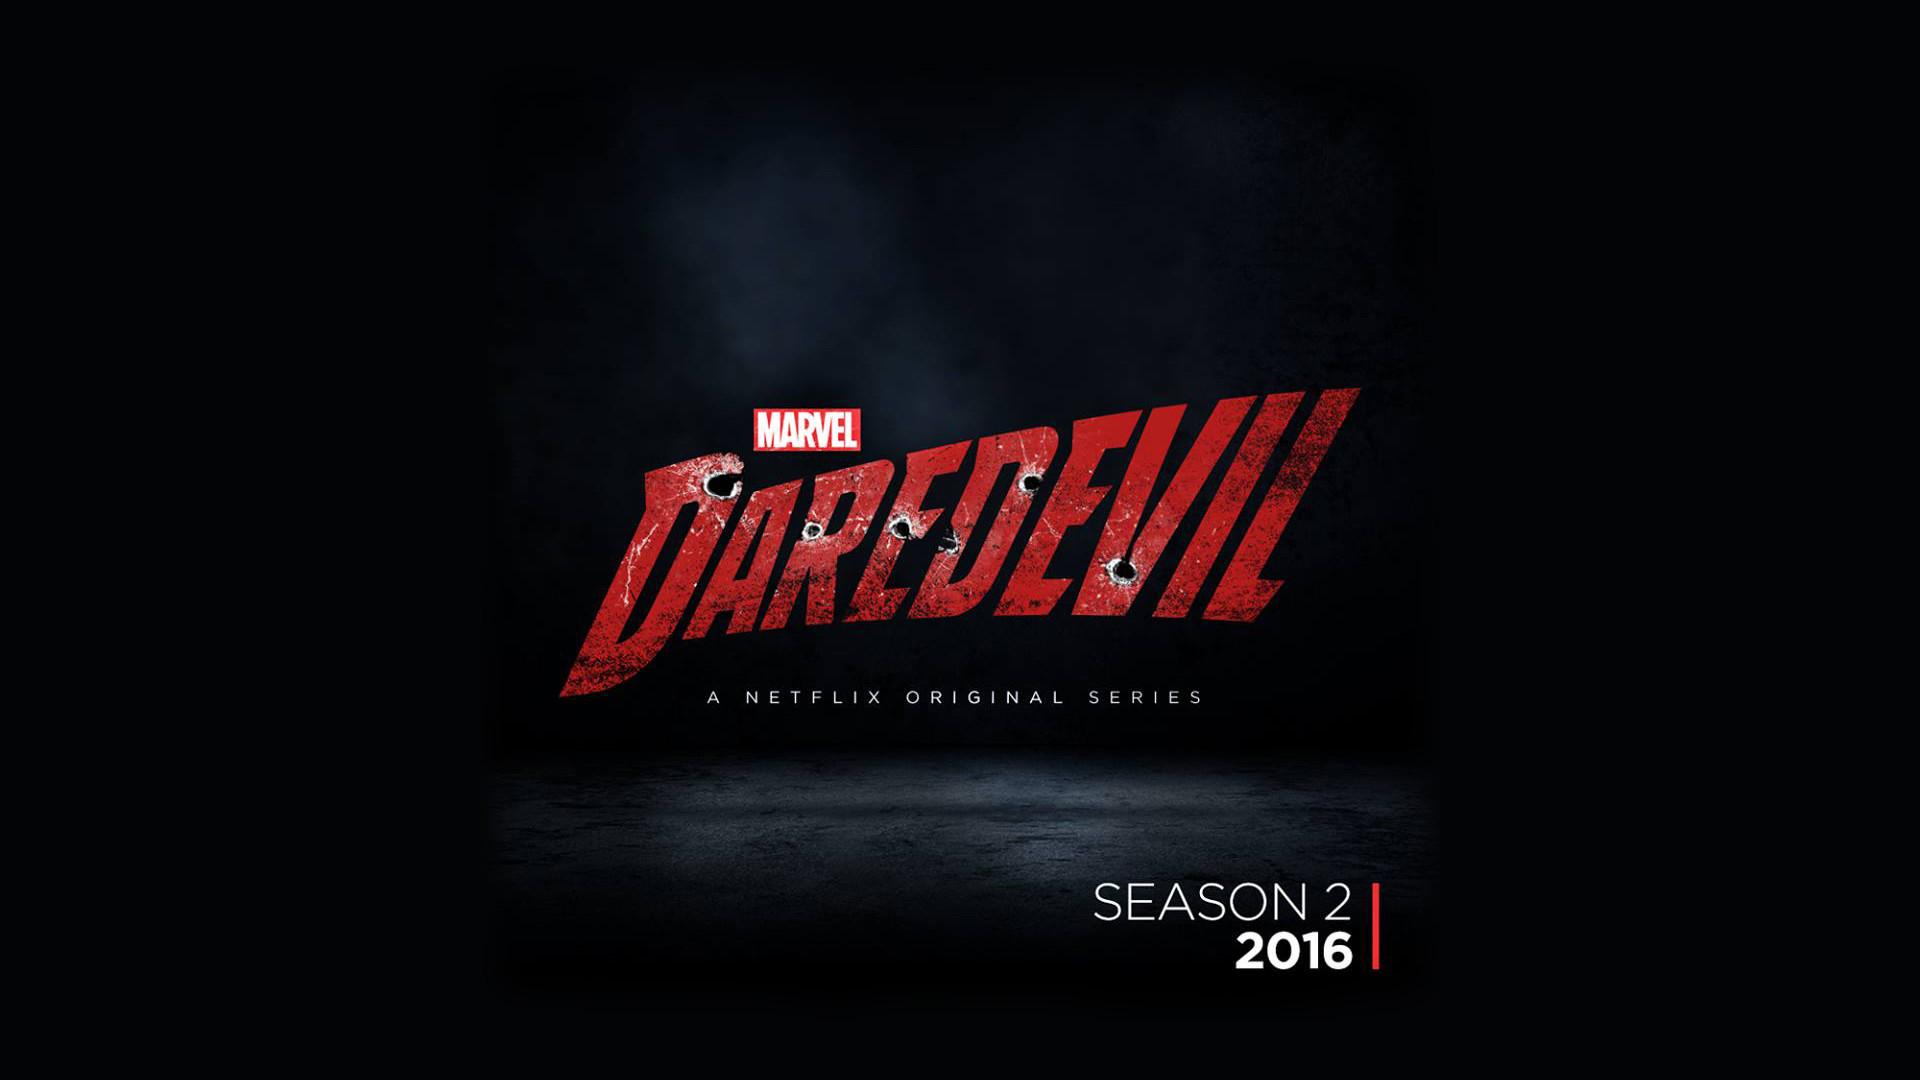 Res: 1920x1080, Daredevil Logo Image On Wallpaper Hd 1920 x 1080 px 623.08 KB rivera logo  iphone movie